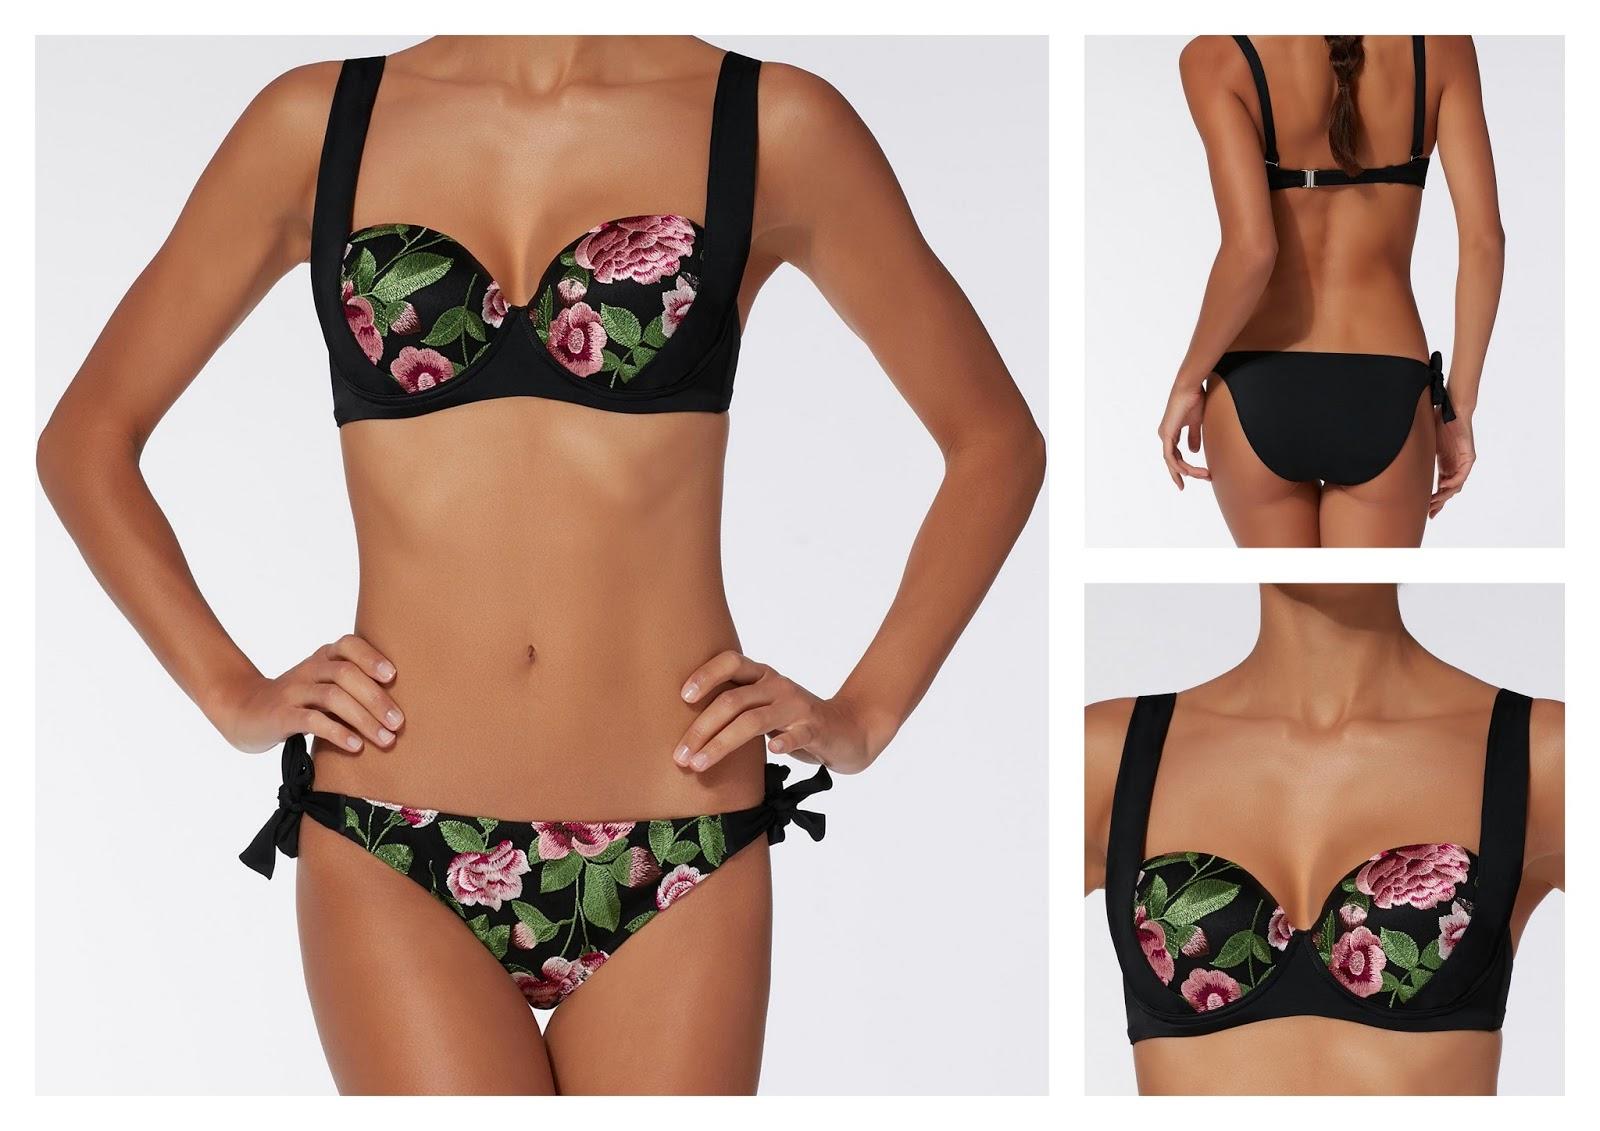 5fbbaf483d3 Bikini con top anudado - ZAFUL. COMPRAR. Bikini push up bordados Alison -  CALZEDONIA